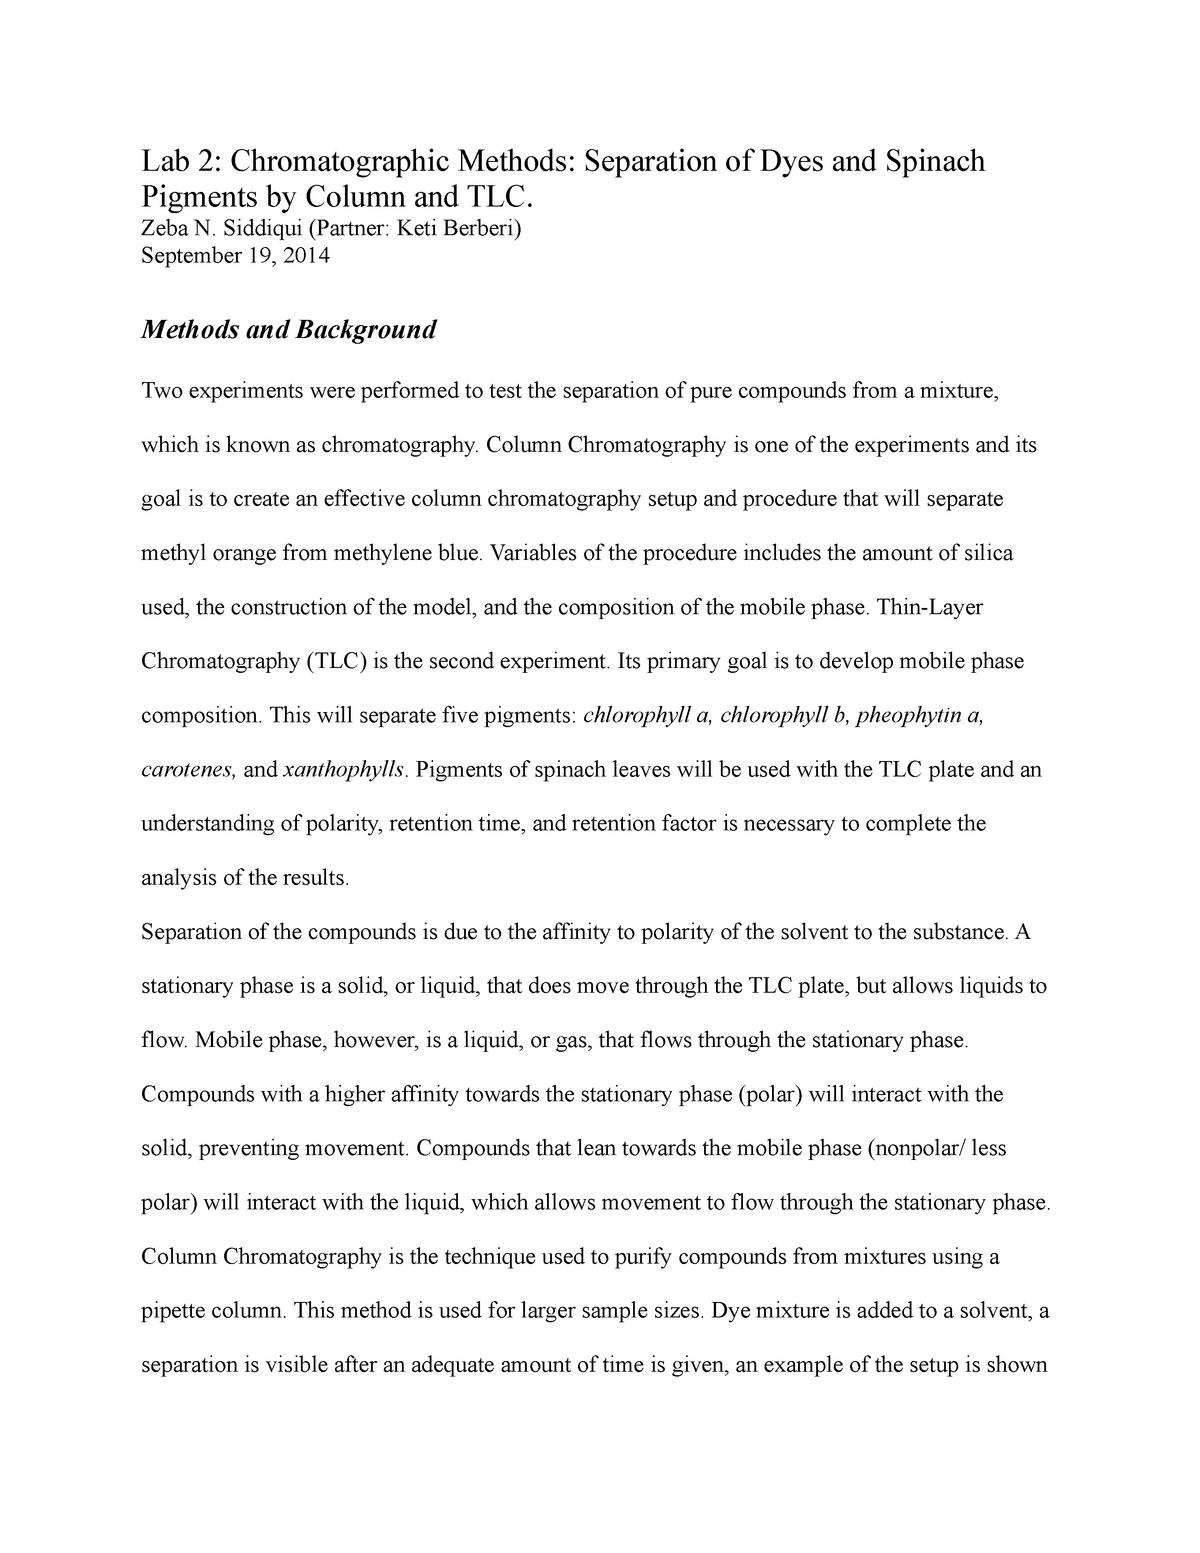 Lab Report 2 - Lecture notes 2 22 - CHEM 233 - UIC - StuDocu